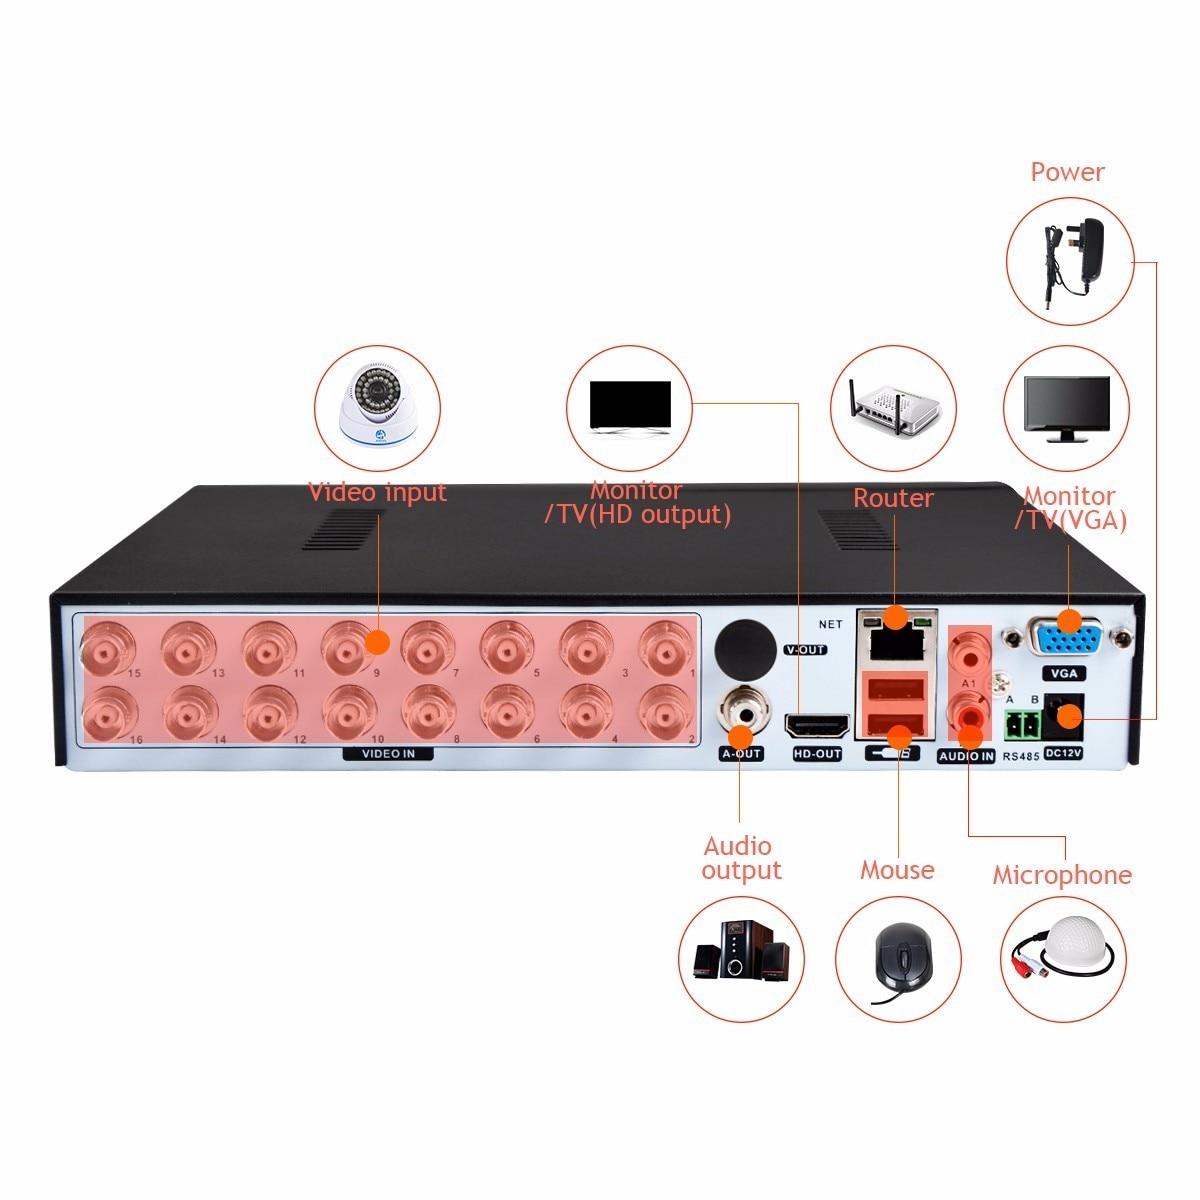 JOOAN 4216T 16CH CCTV DVR H.264 HD-OUT P2P Καταγραφέας - Ασφάλεια και προστασία - Φωτογραφία 2